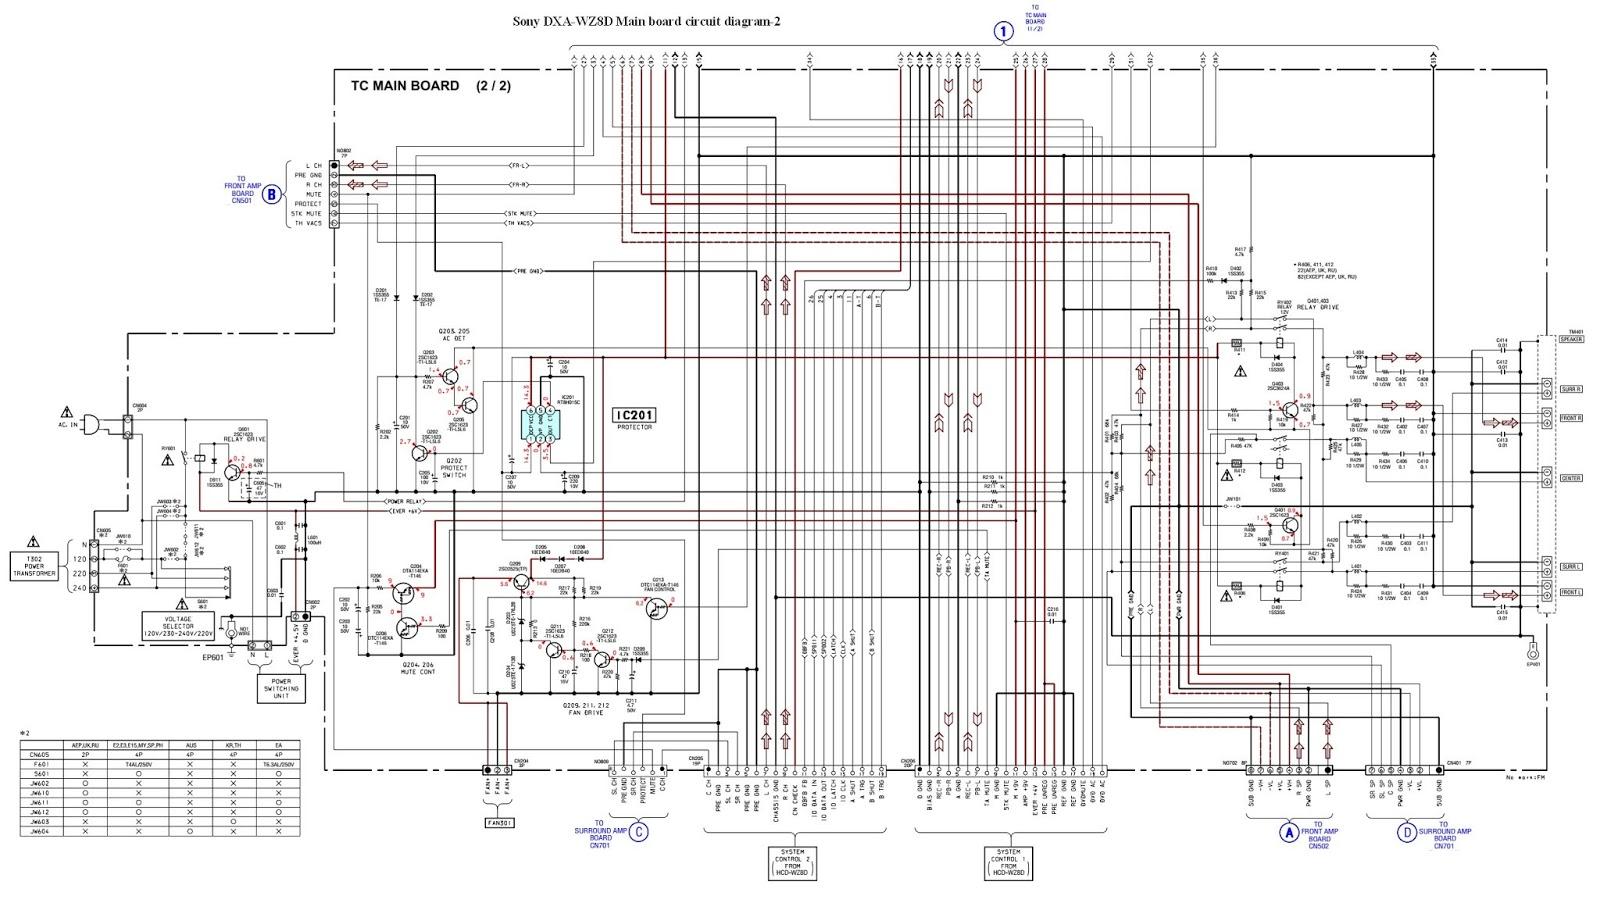 medium resolution of sony dxa wz8d front amplifier board circuit diagram